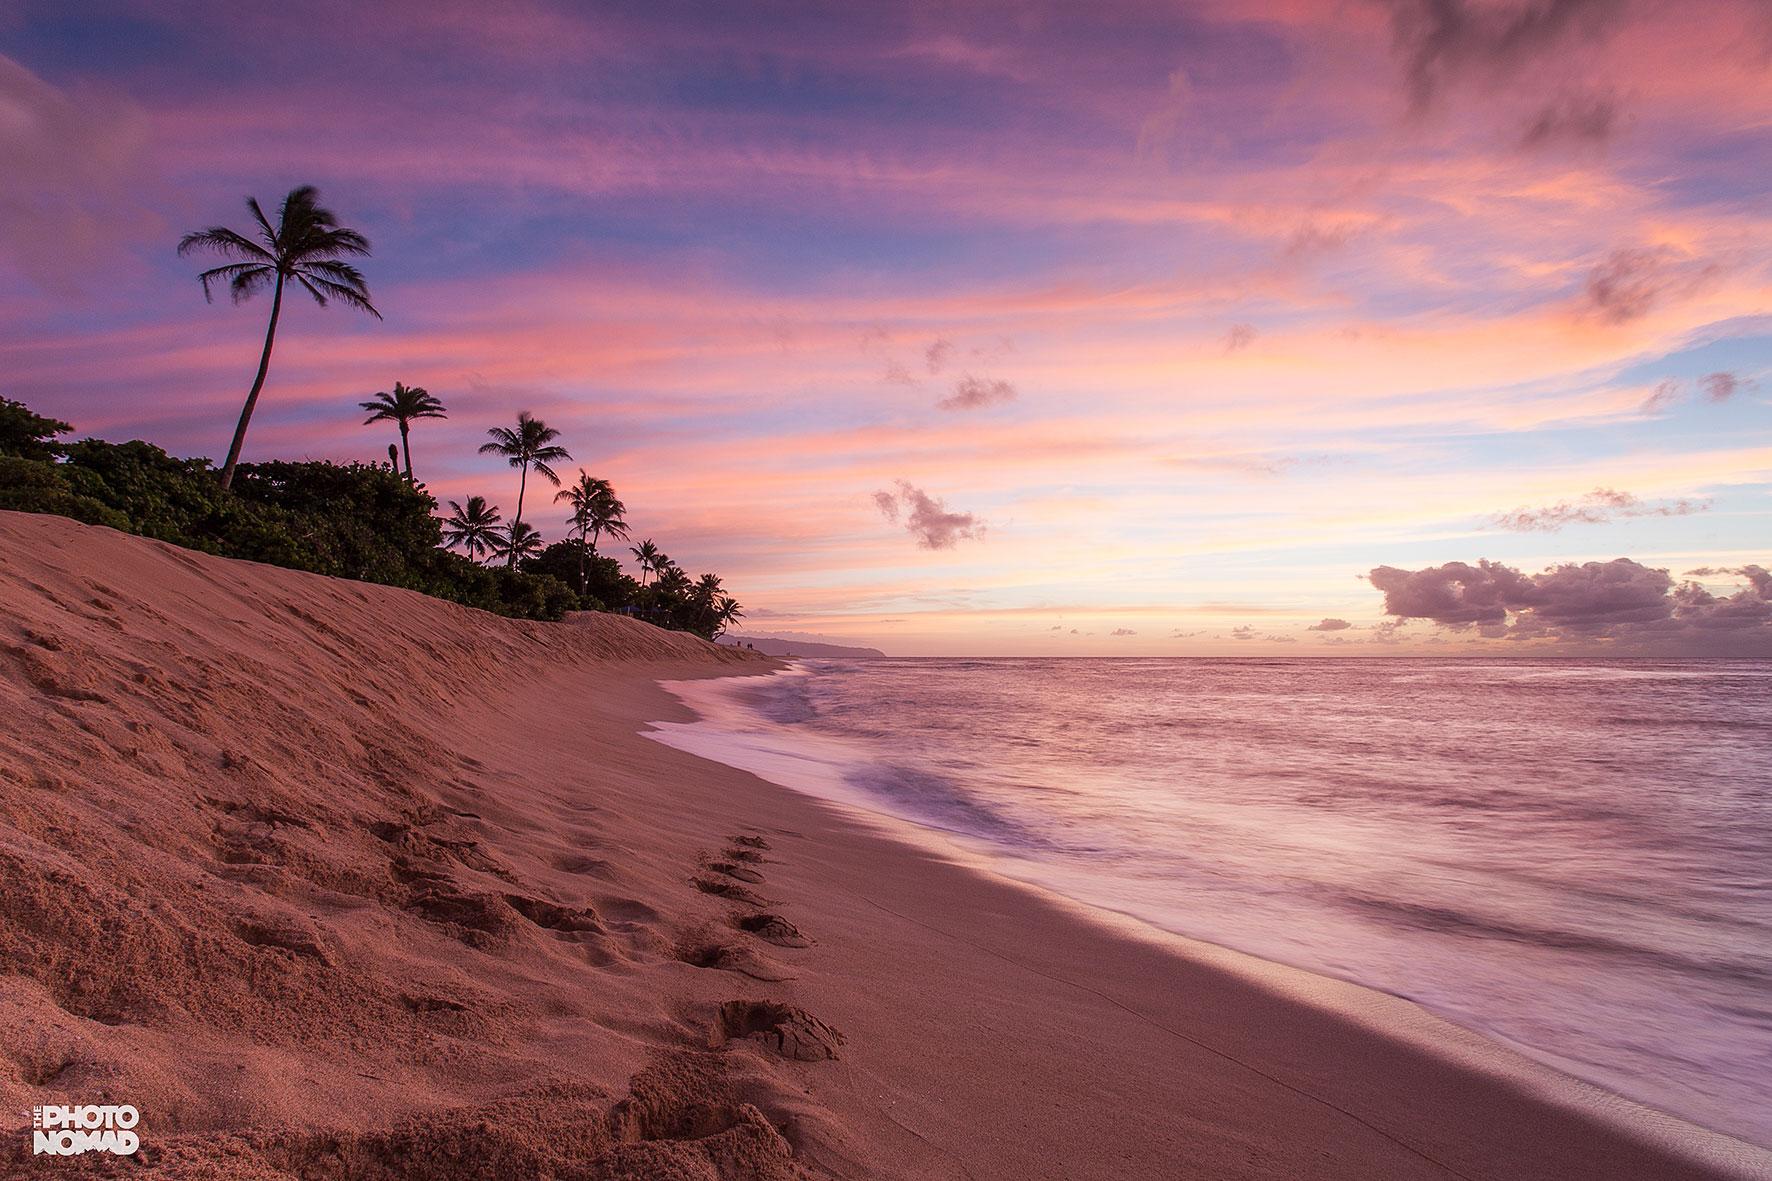 Sunset Beach, North Shore Oahu, Hawaii